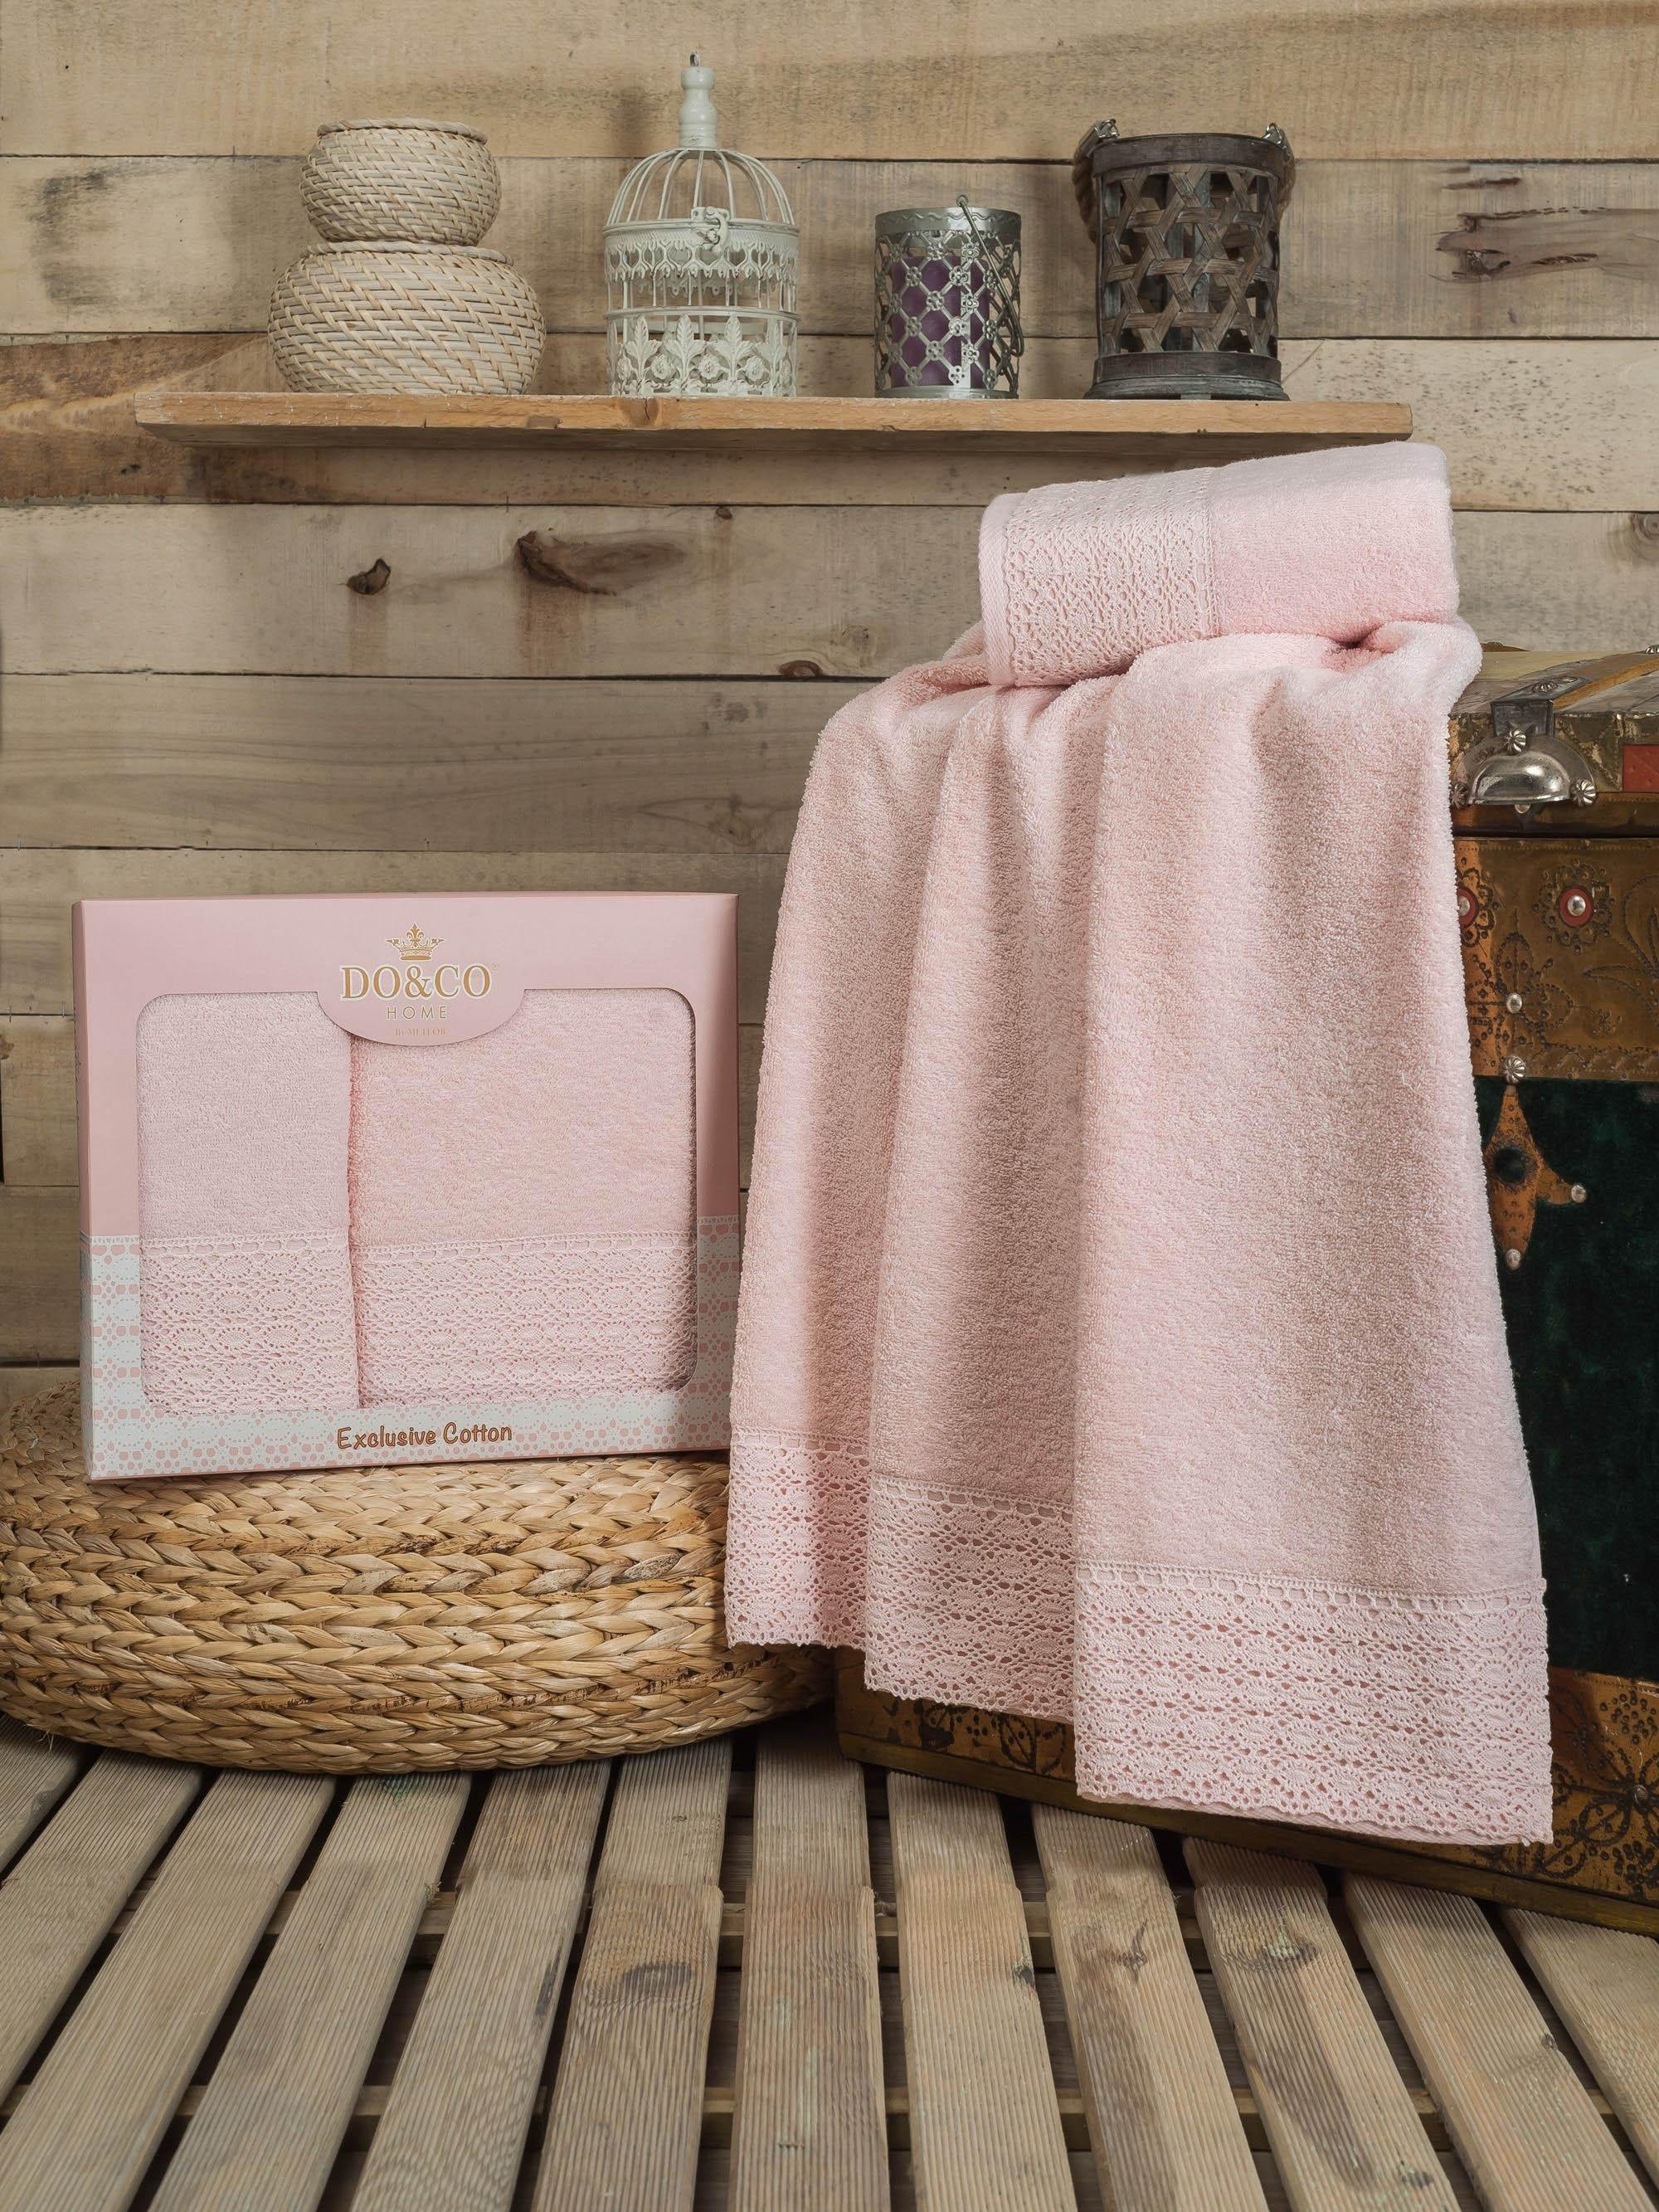 DO'n'CO Полотенце Dantela Цвет: Розовый (Набор)